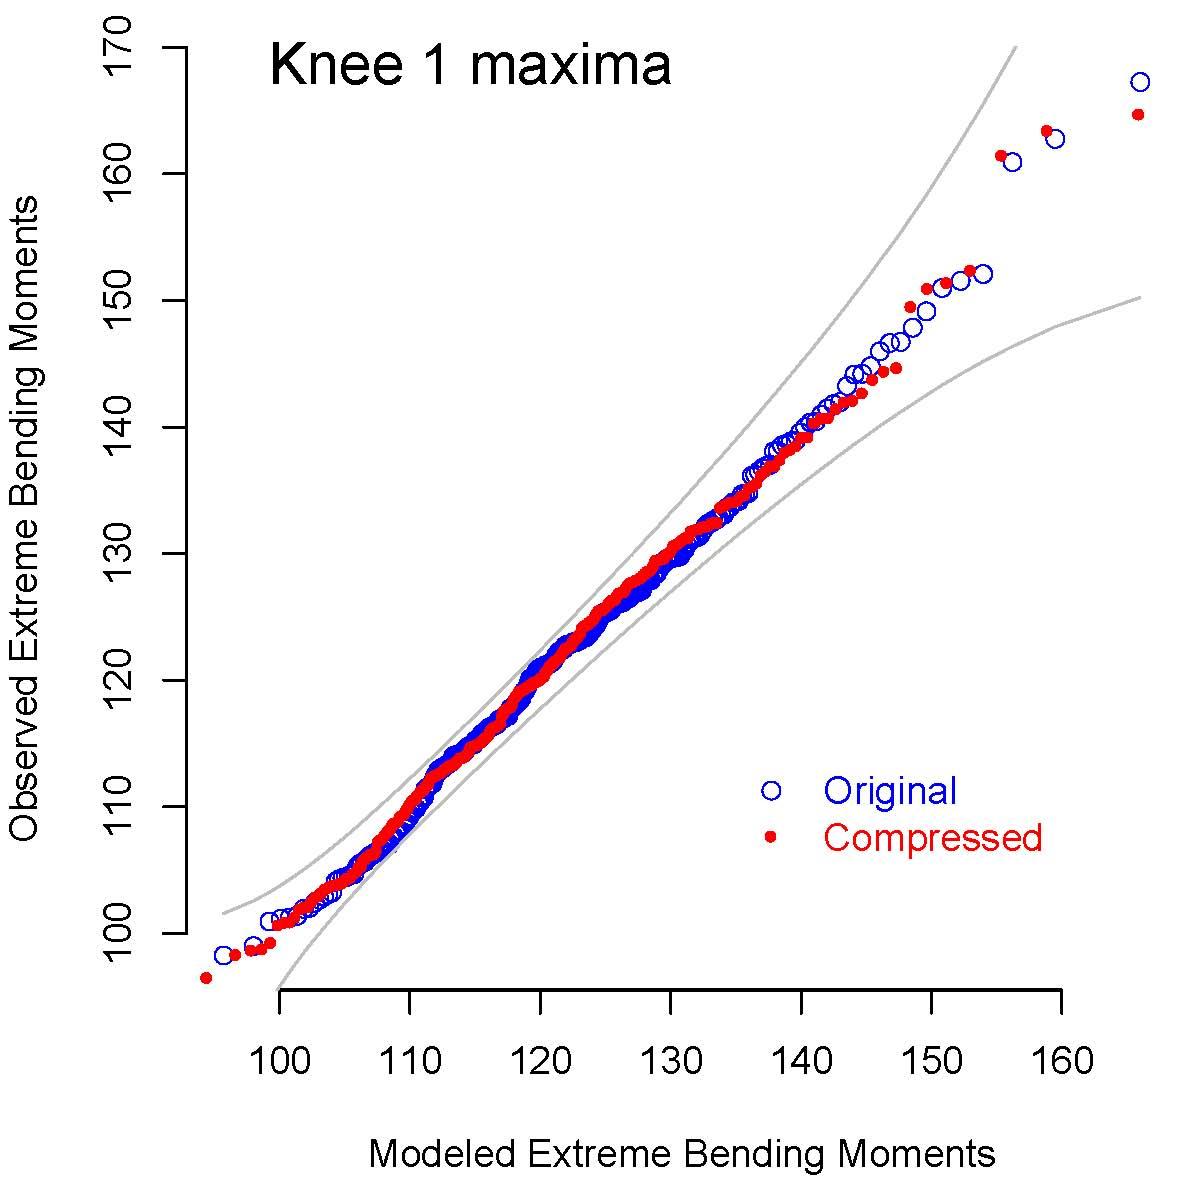 knee1-20min-max-gev